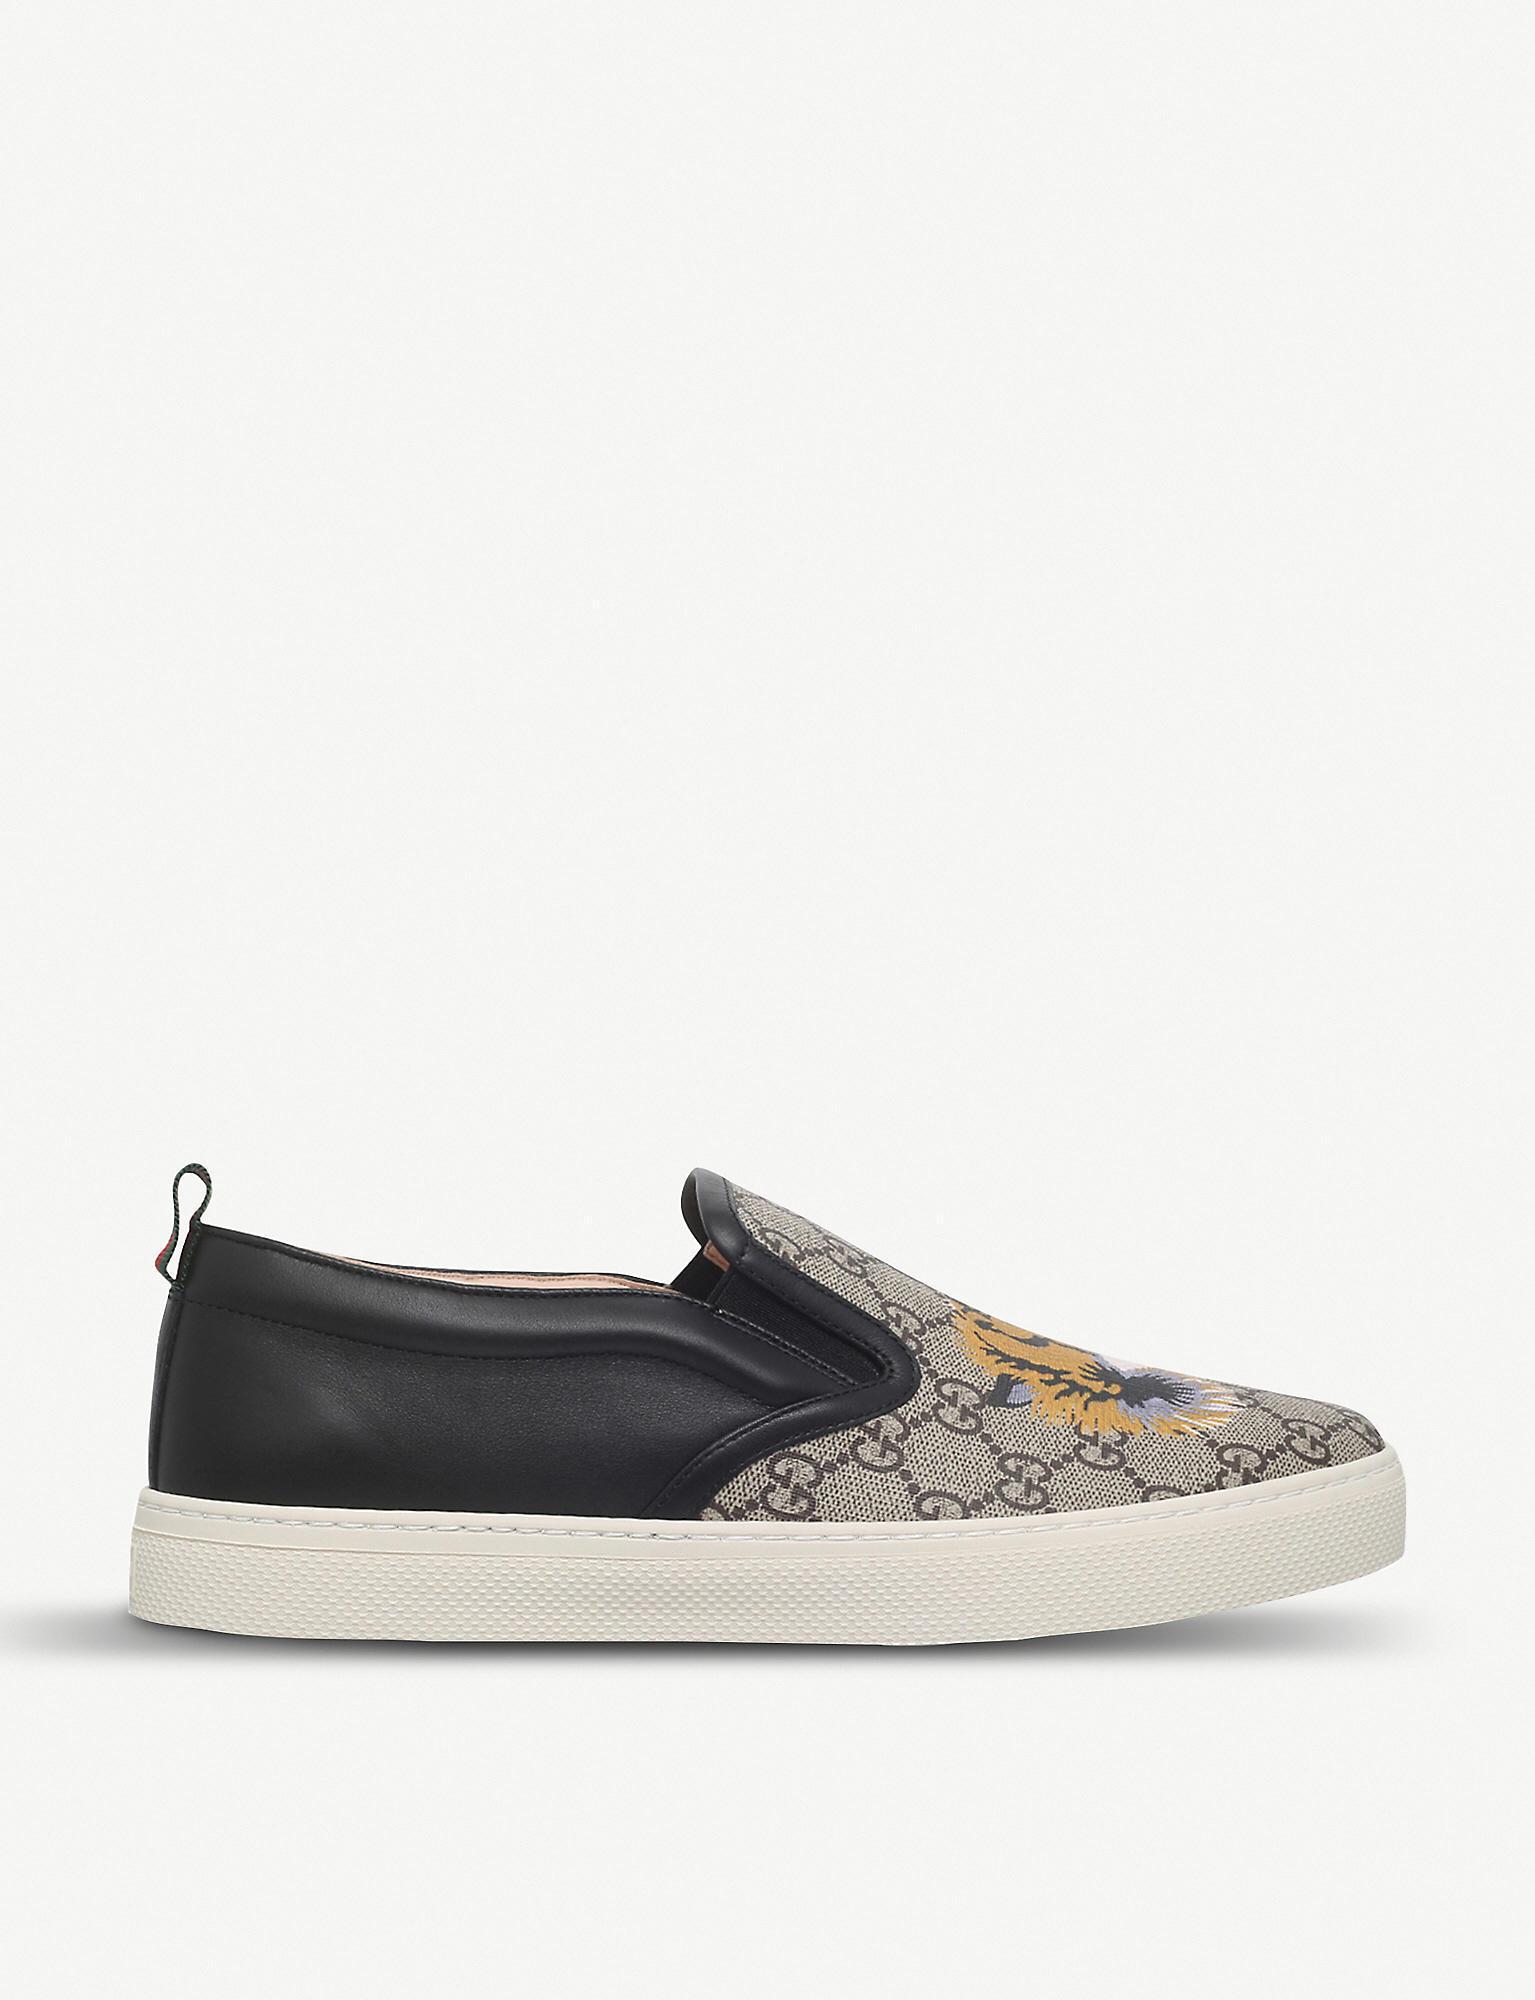 8cf570a9f Gucci - Natural Dublin Tiger Skater Shoes for Men - Lyst. View fullscreen